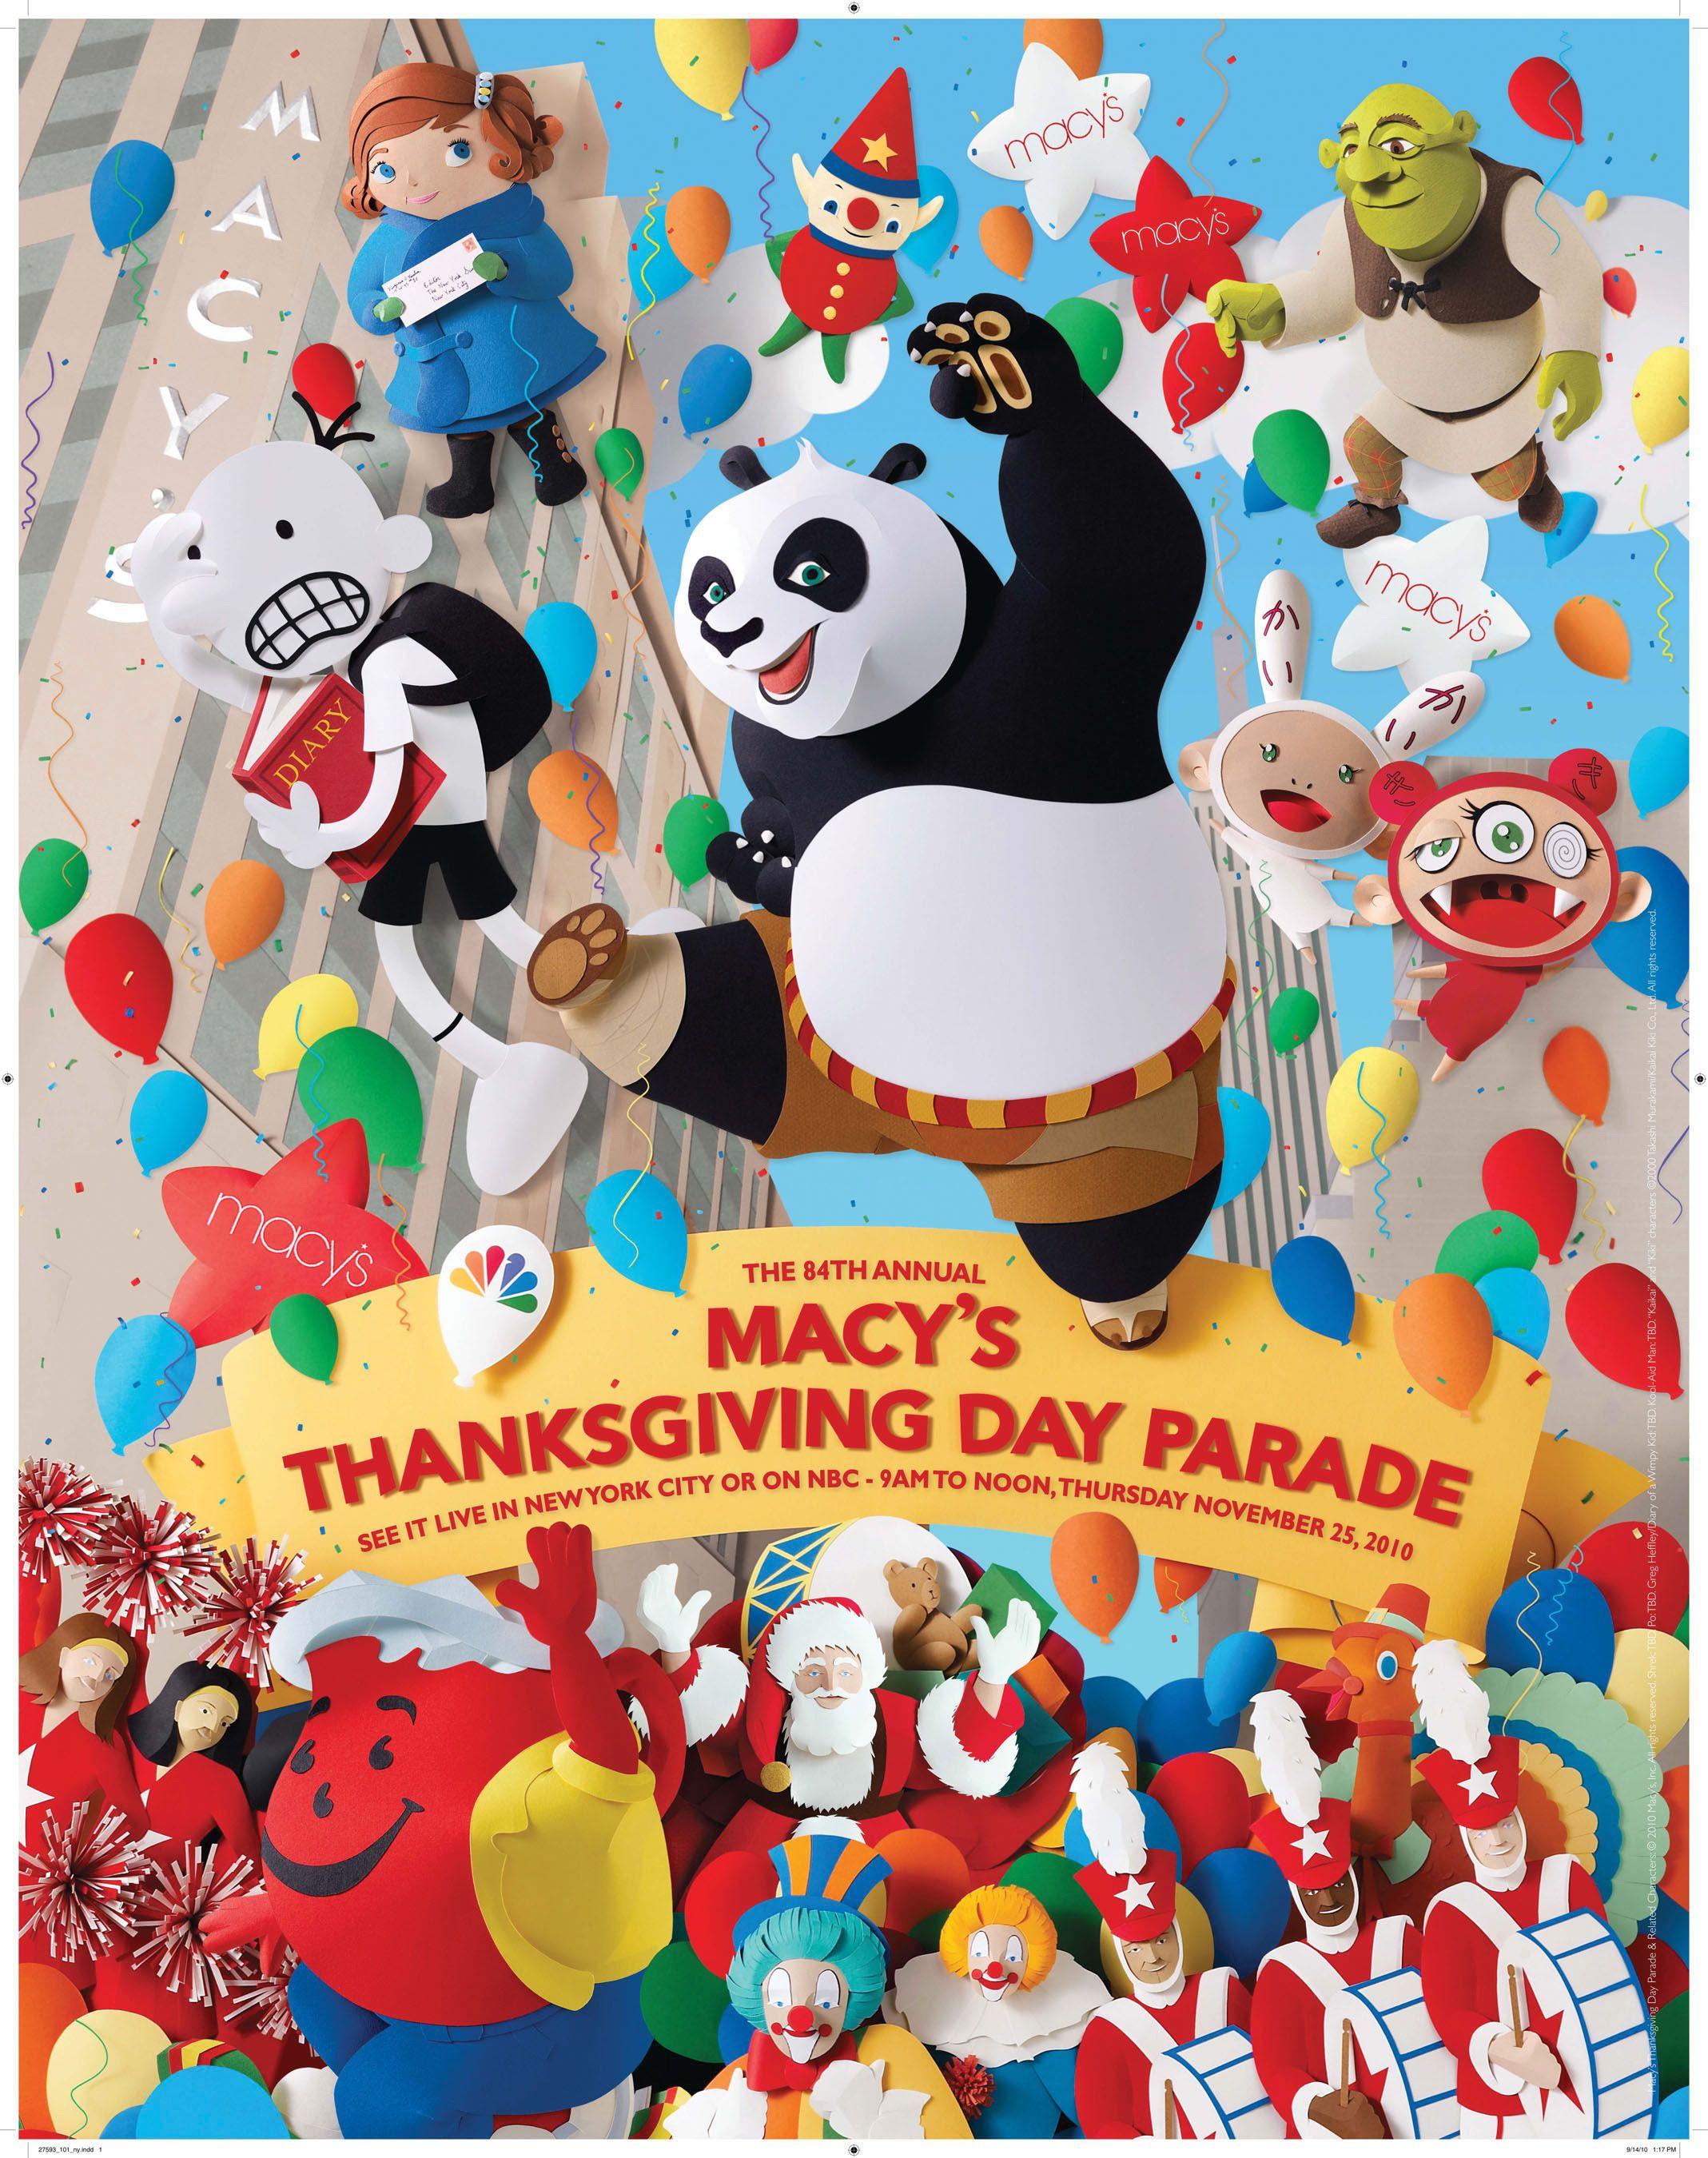 Macy S Thanksgiving Day Parade Thanksgiving Day Parade Macys Thanksgiving Parade Macy S Thanksgiving Day Parade